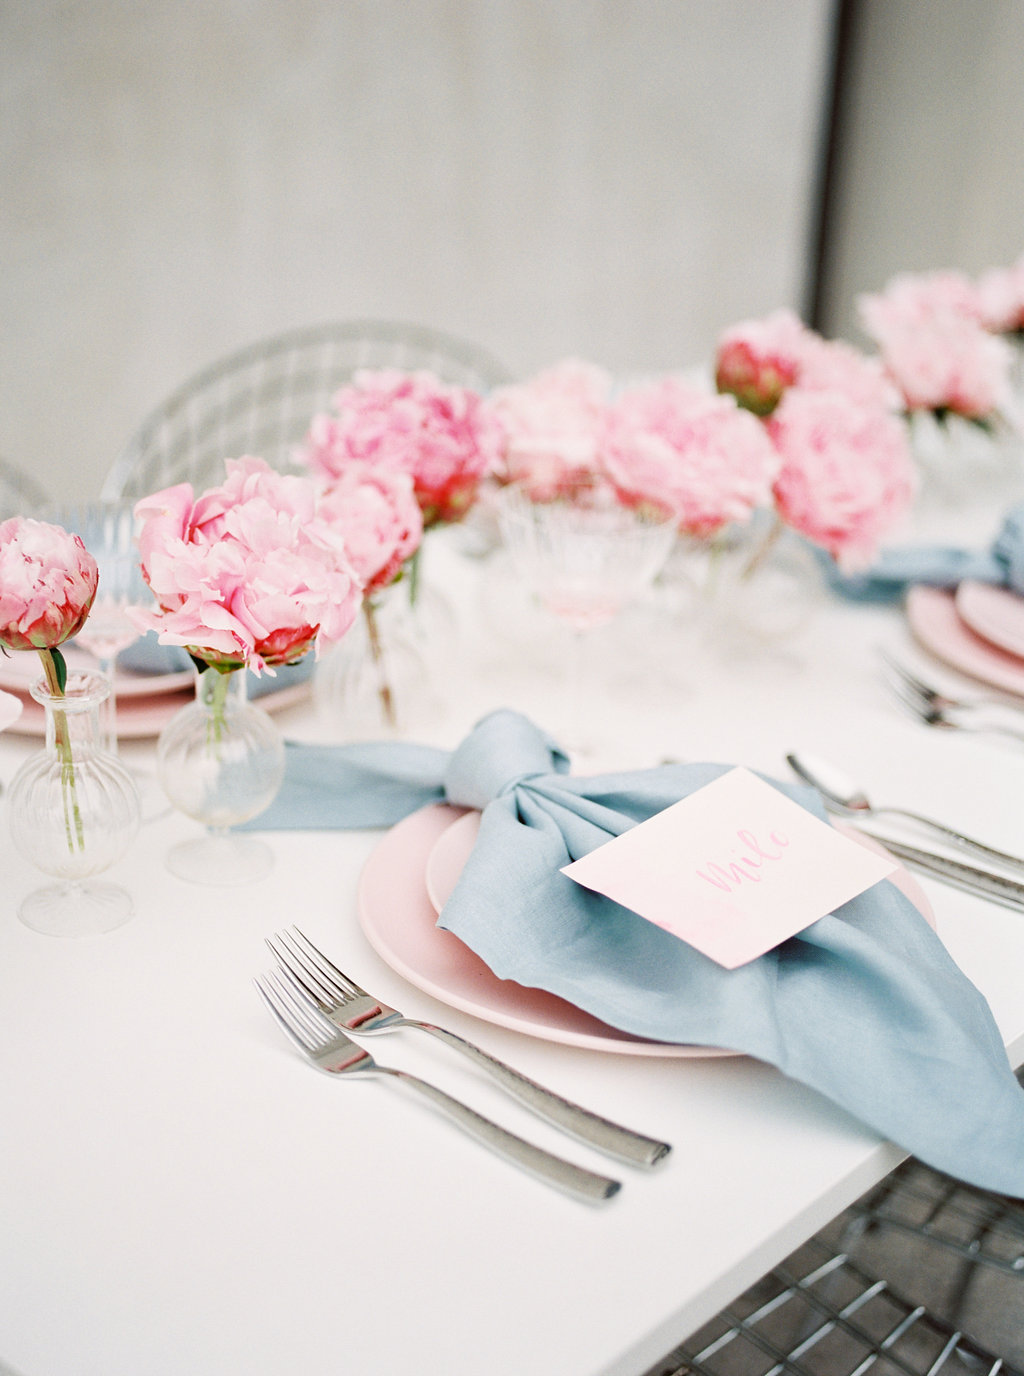 pink and blue weddings - photo by Awake Photography http://ruffledblog.com/sweet-peony-bridal-inspiration